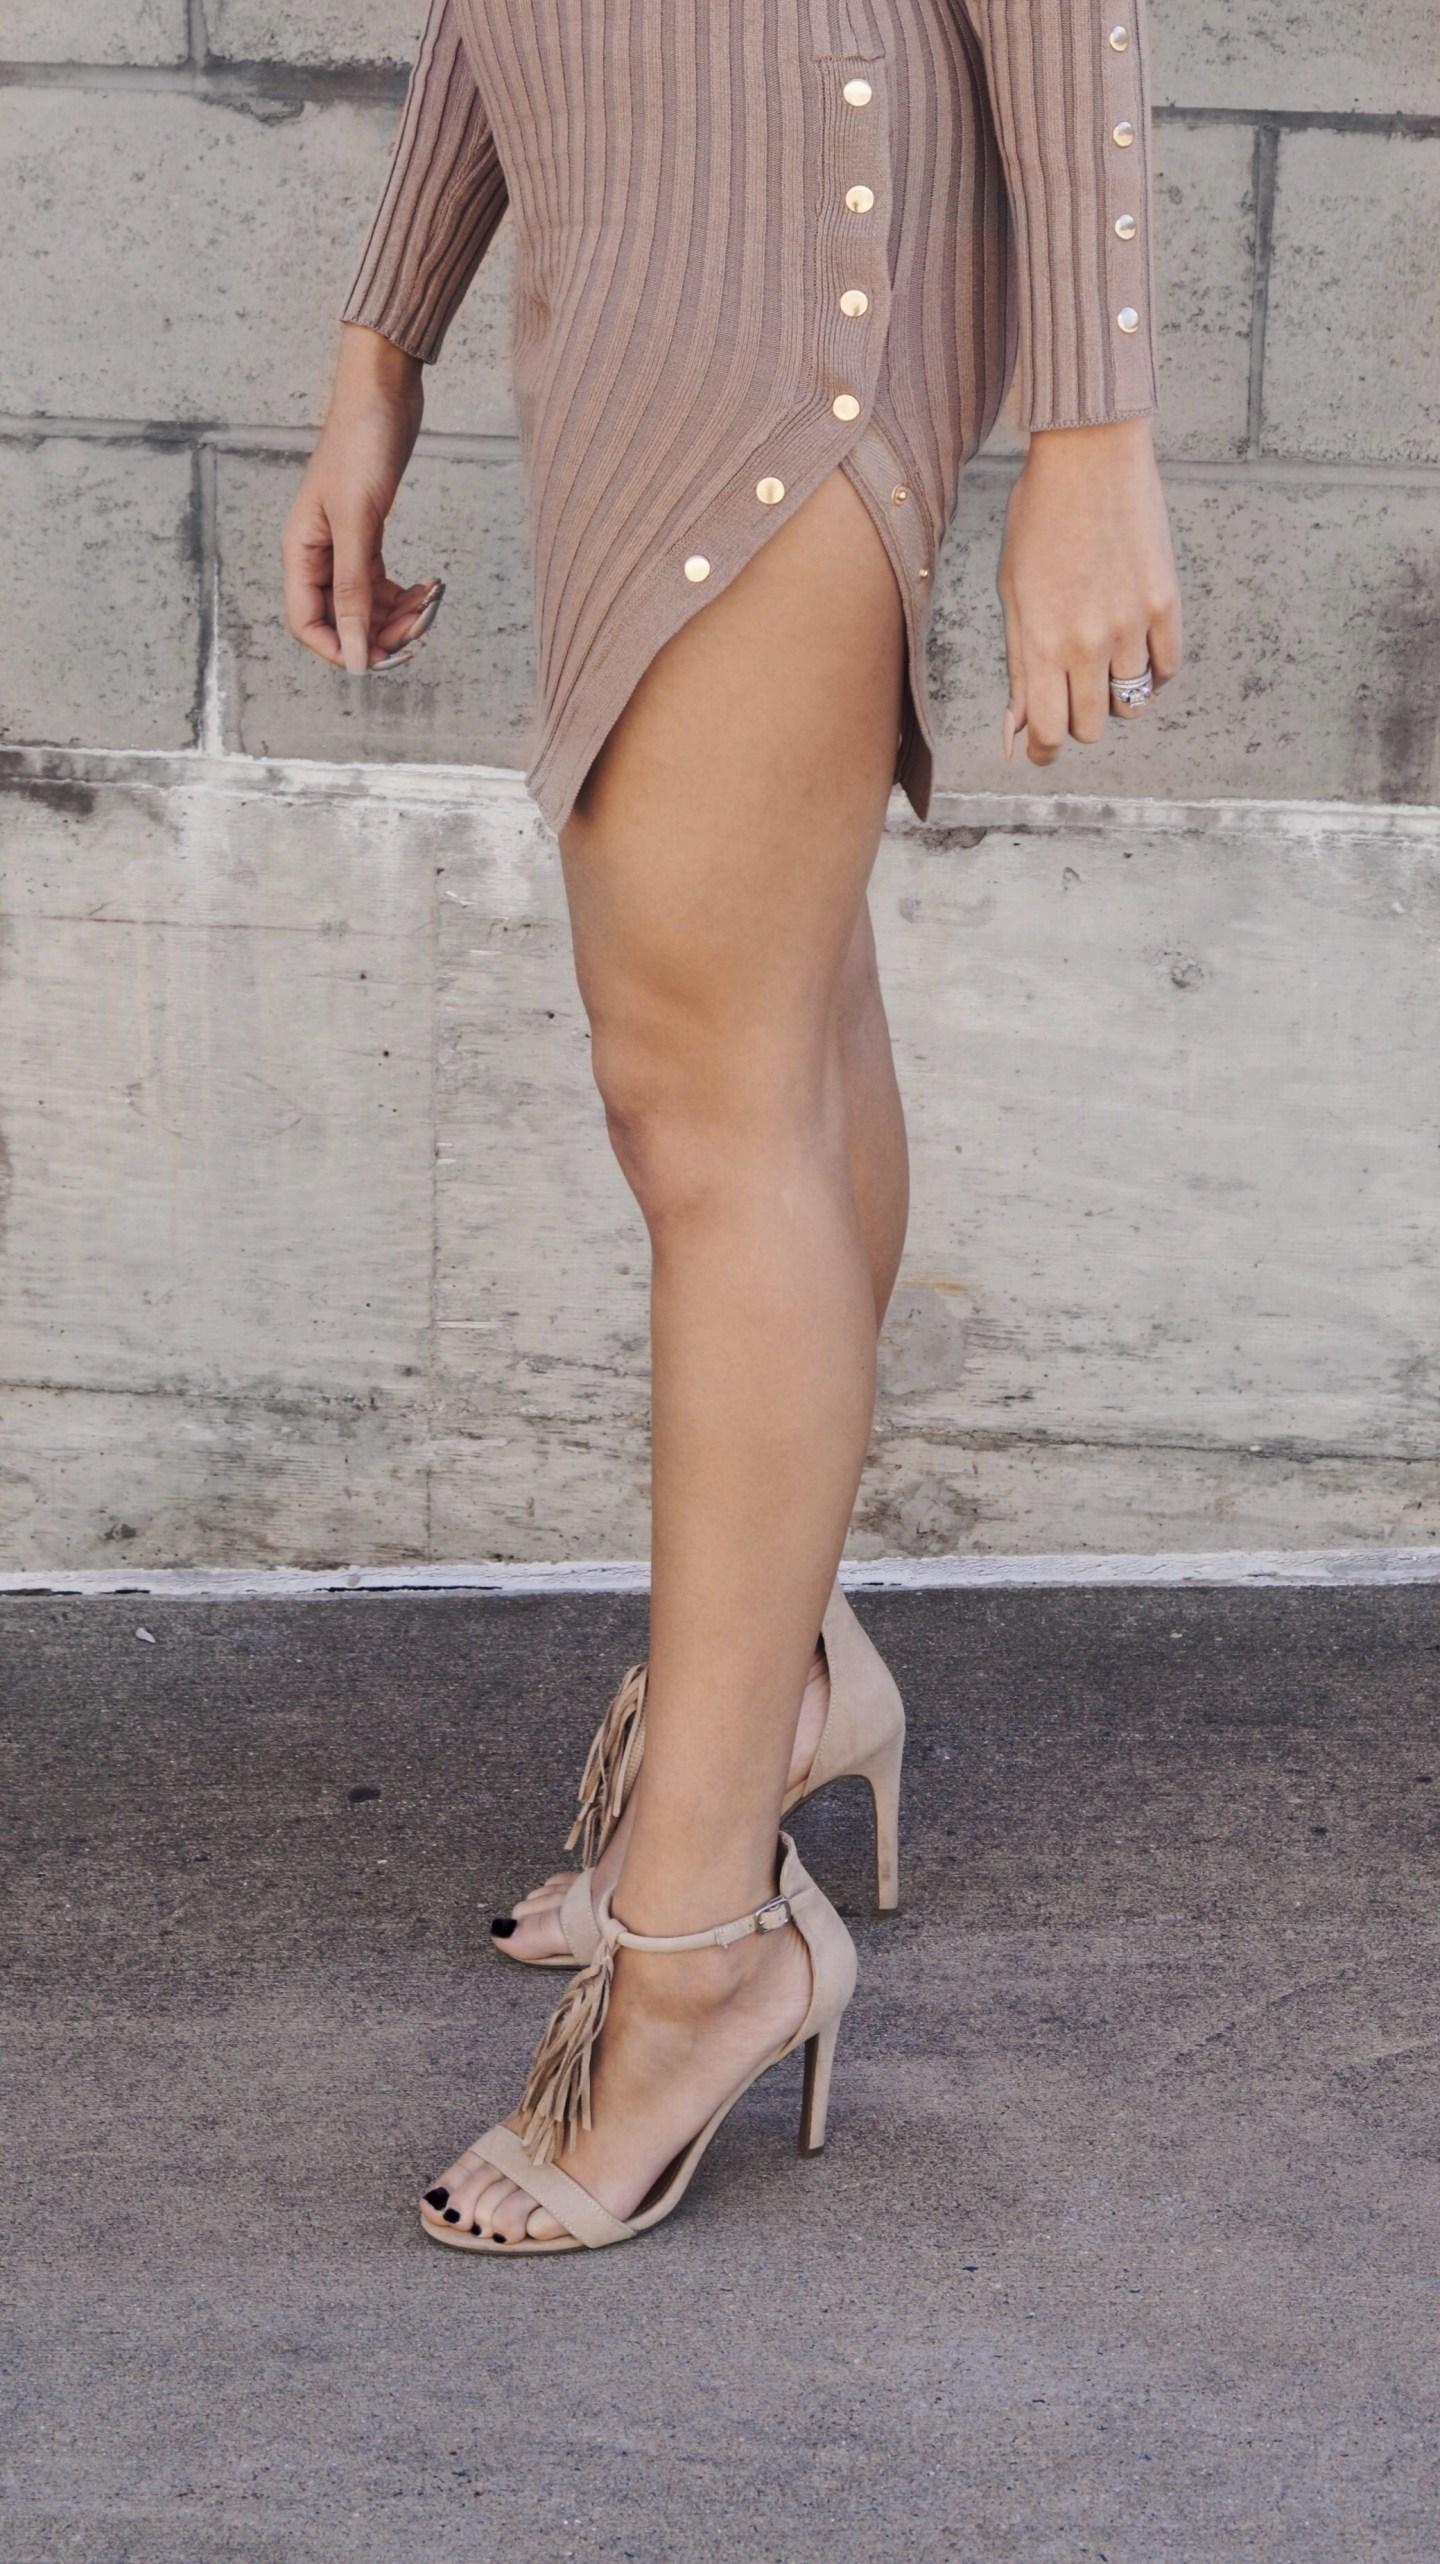 Naked Wardrobe Button Nude Dress Fashion and Style Blog fashionikki.com